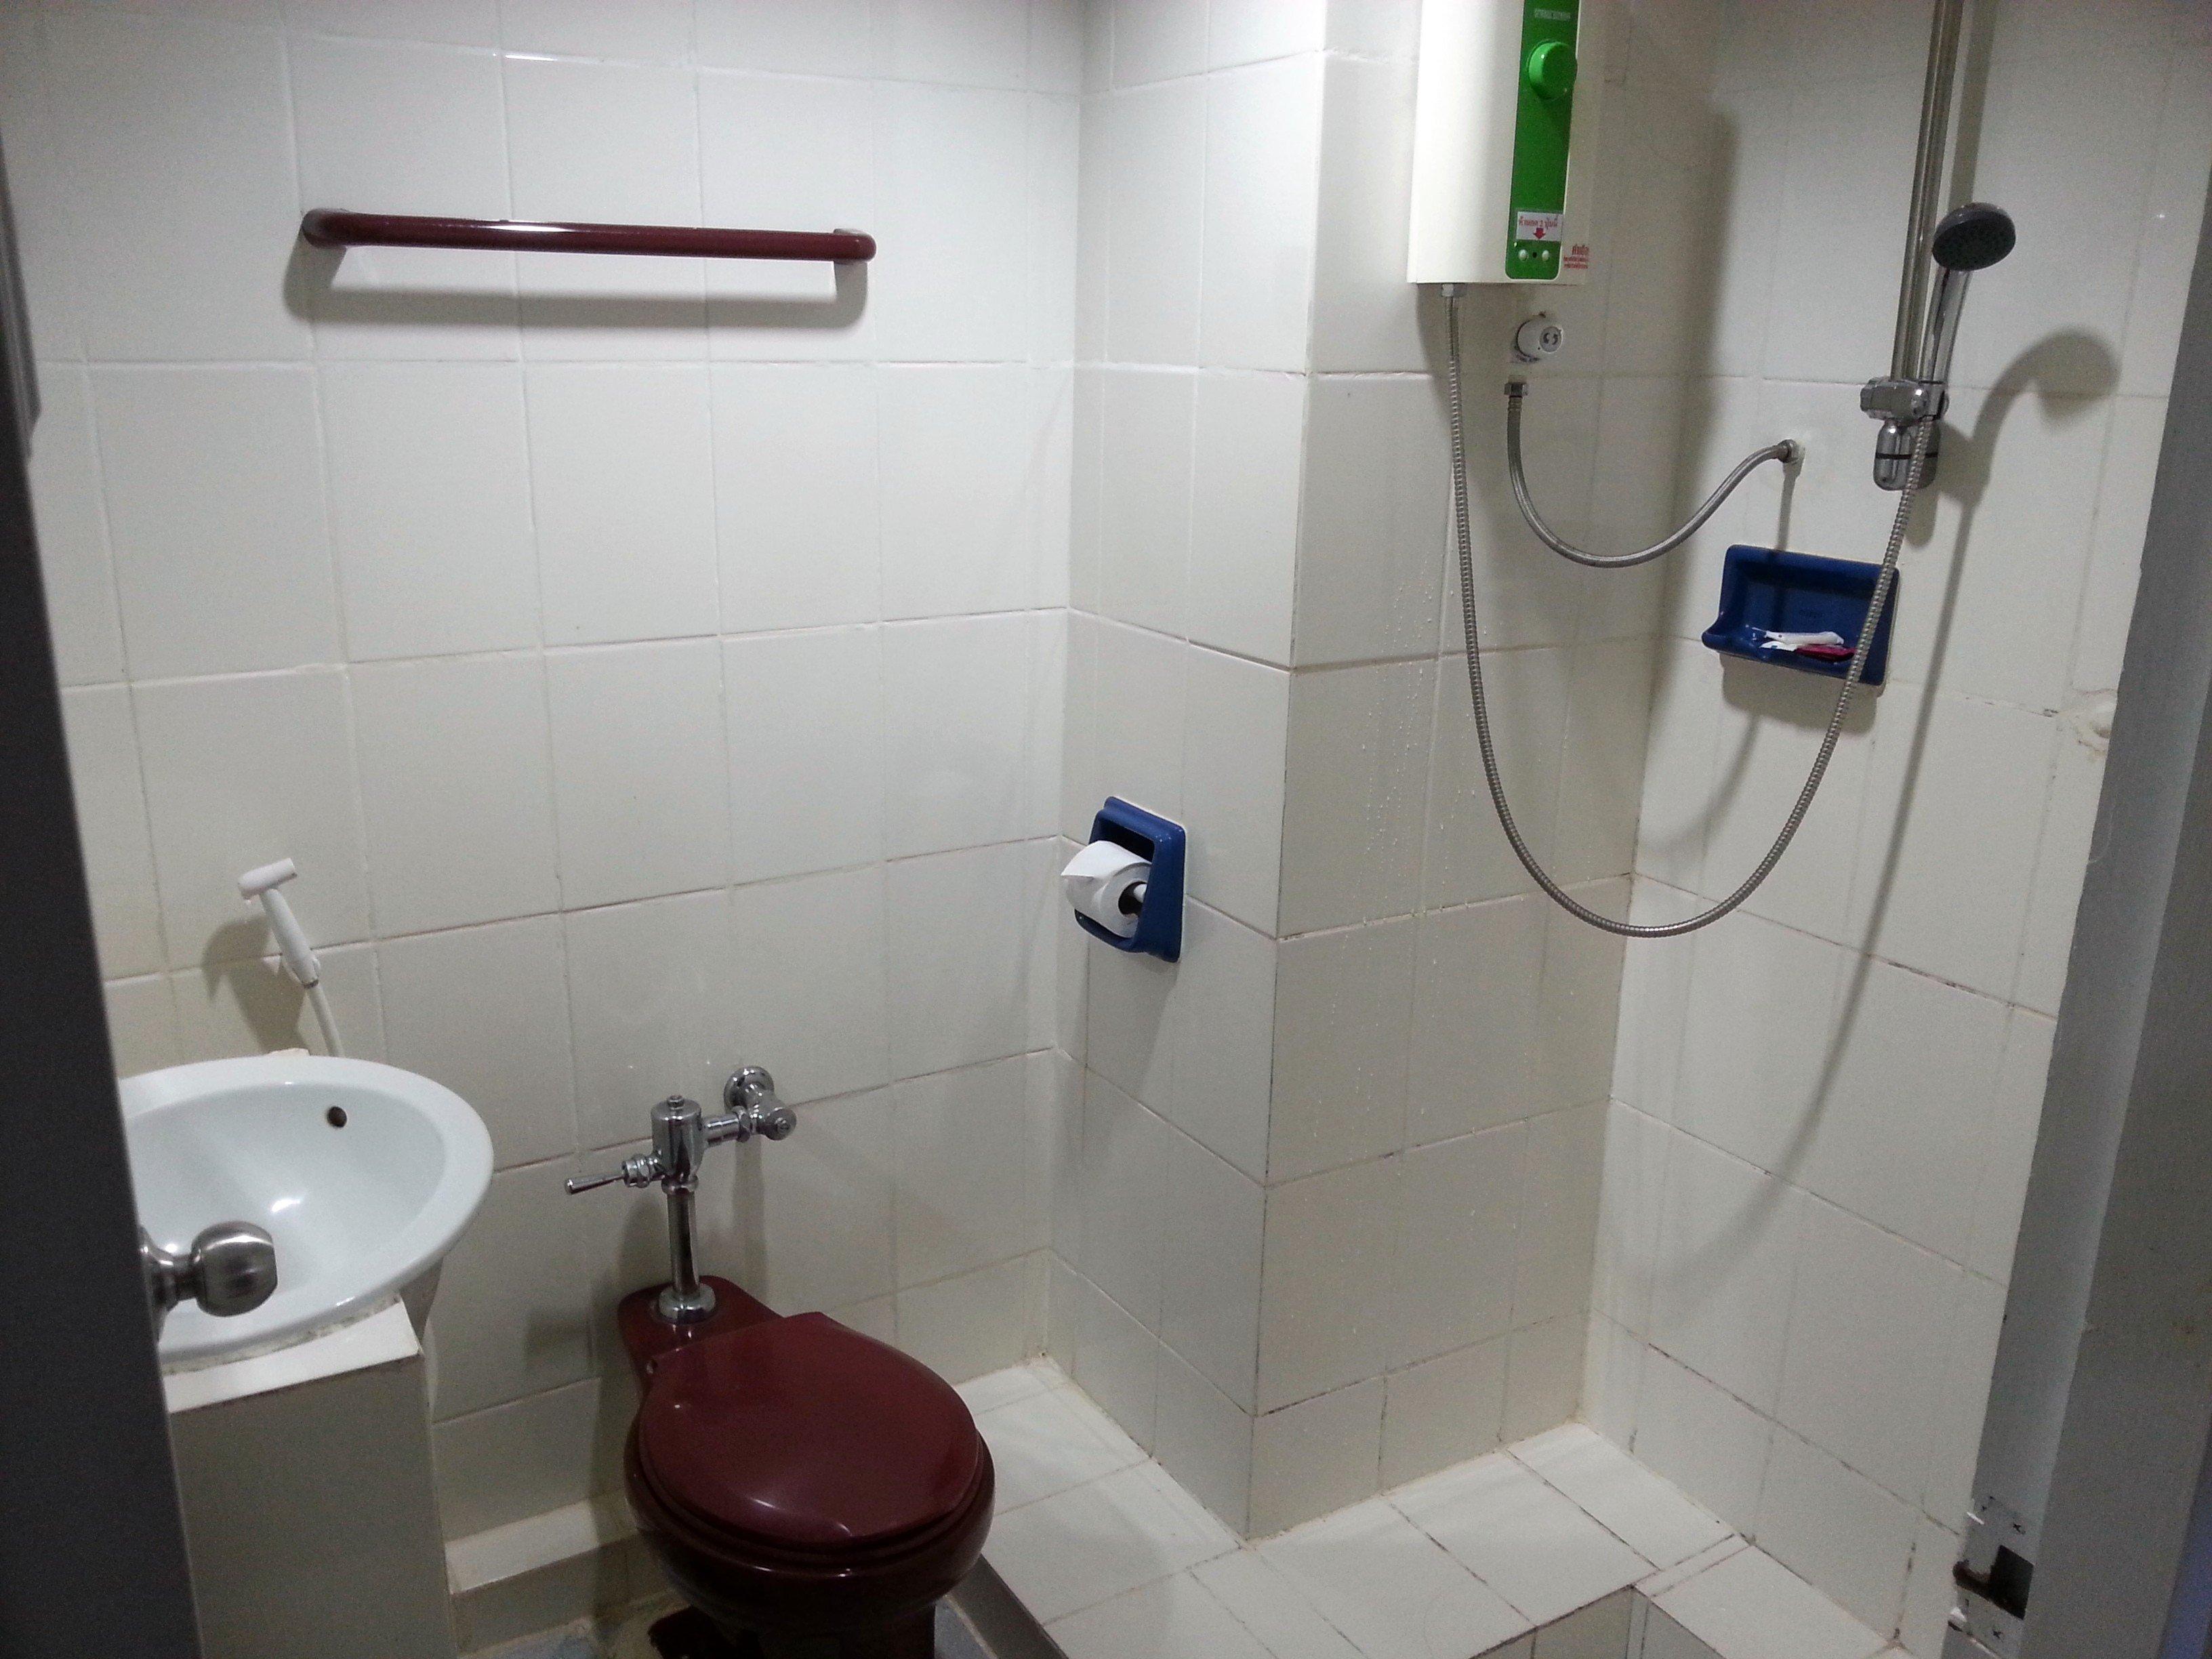 Bathroom at the Imperial Sakon Hotel